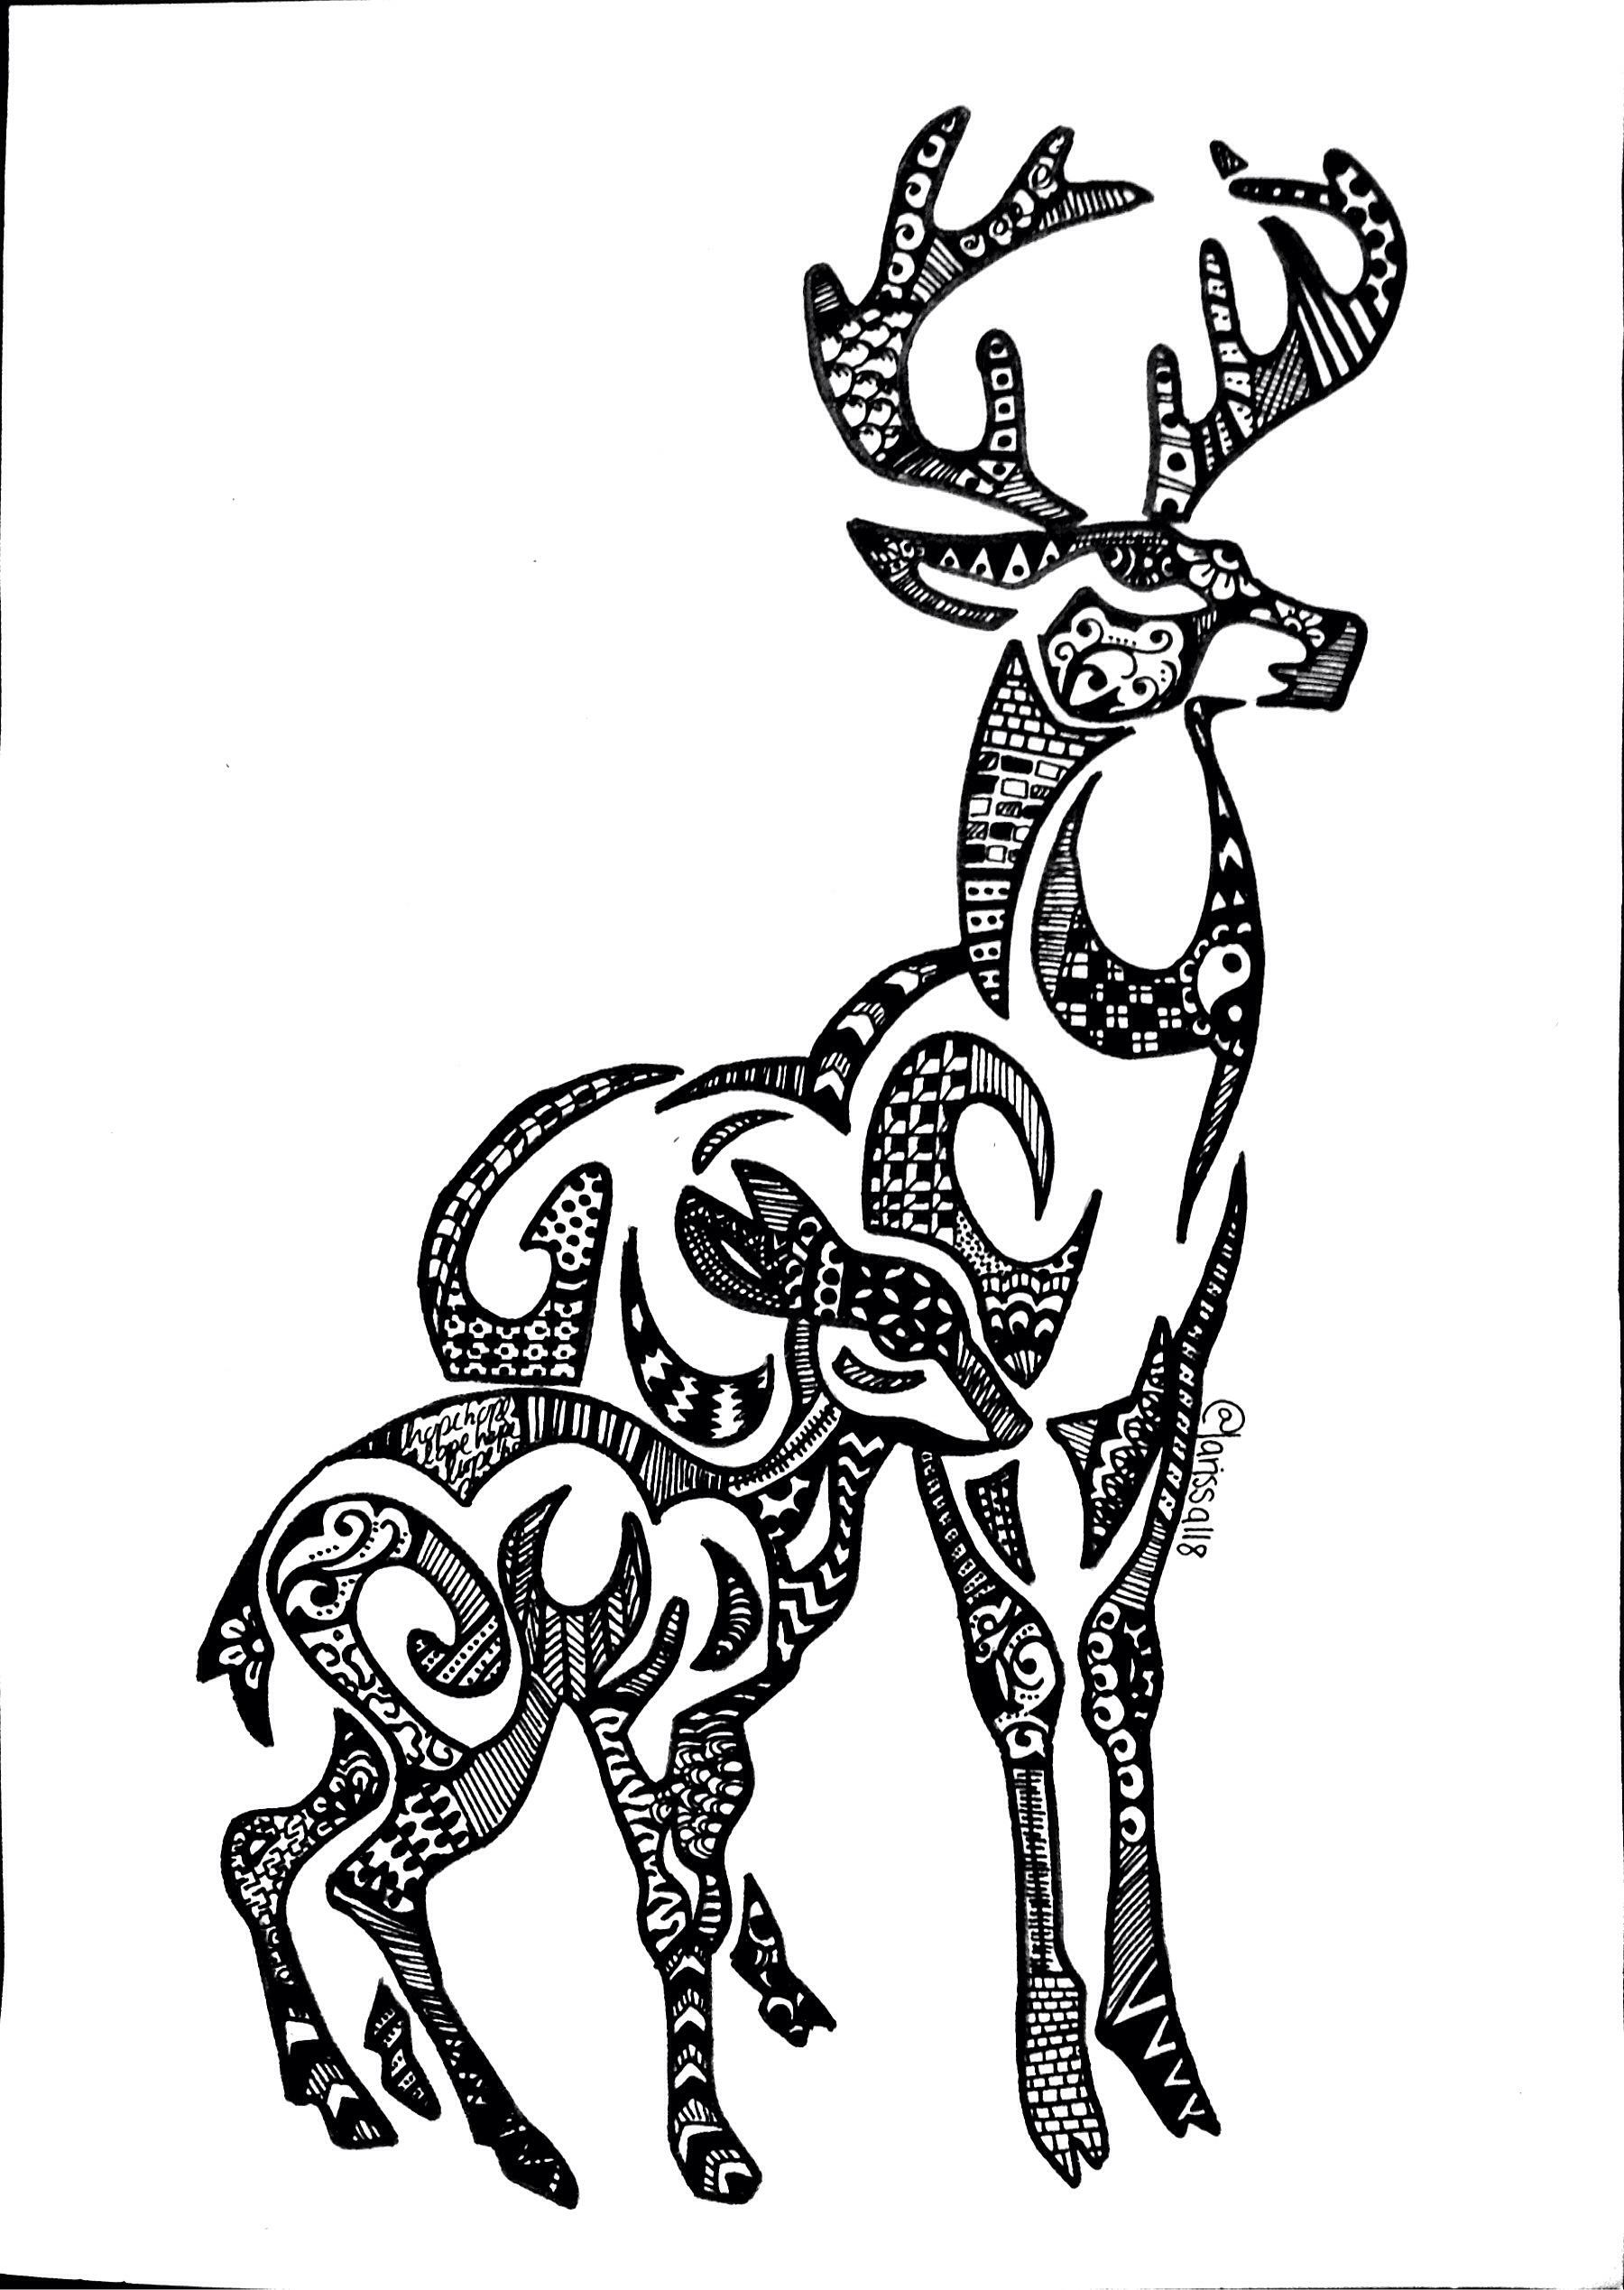 Aren't you just a Deer